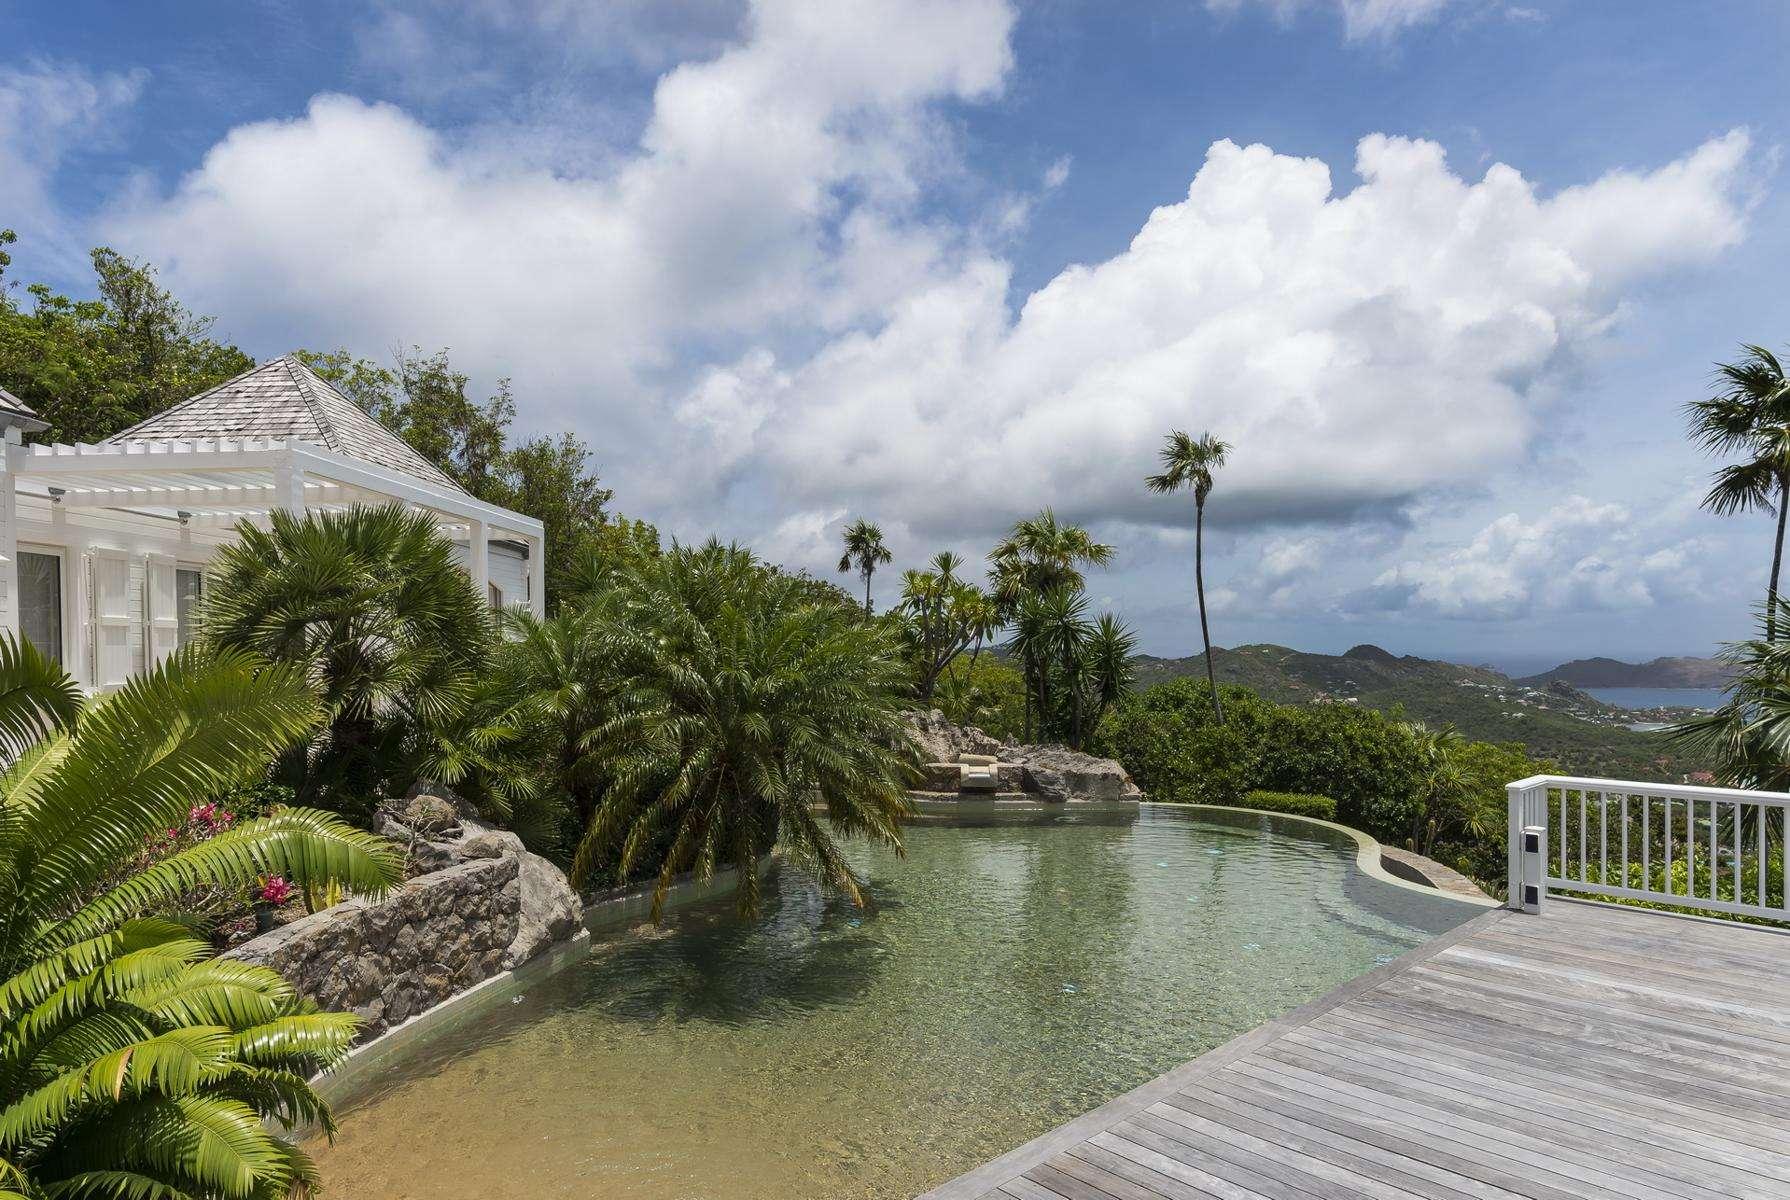 Luxury villa rentals caribbean - St barthelemy - Lurin - No location 4 - L'Oustau - Image 1/46